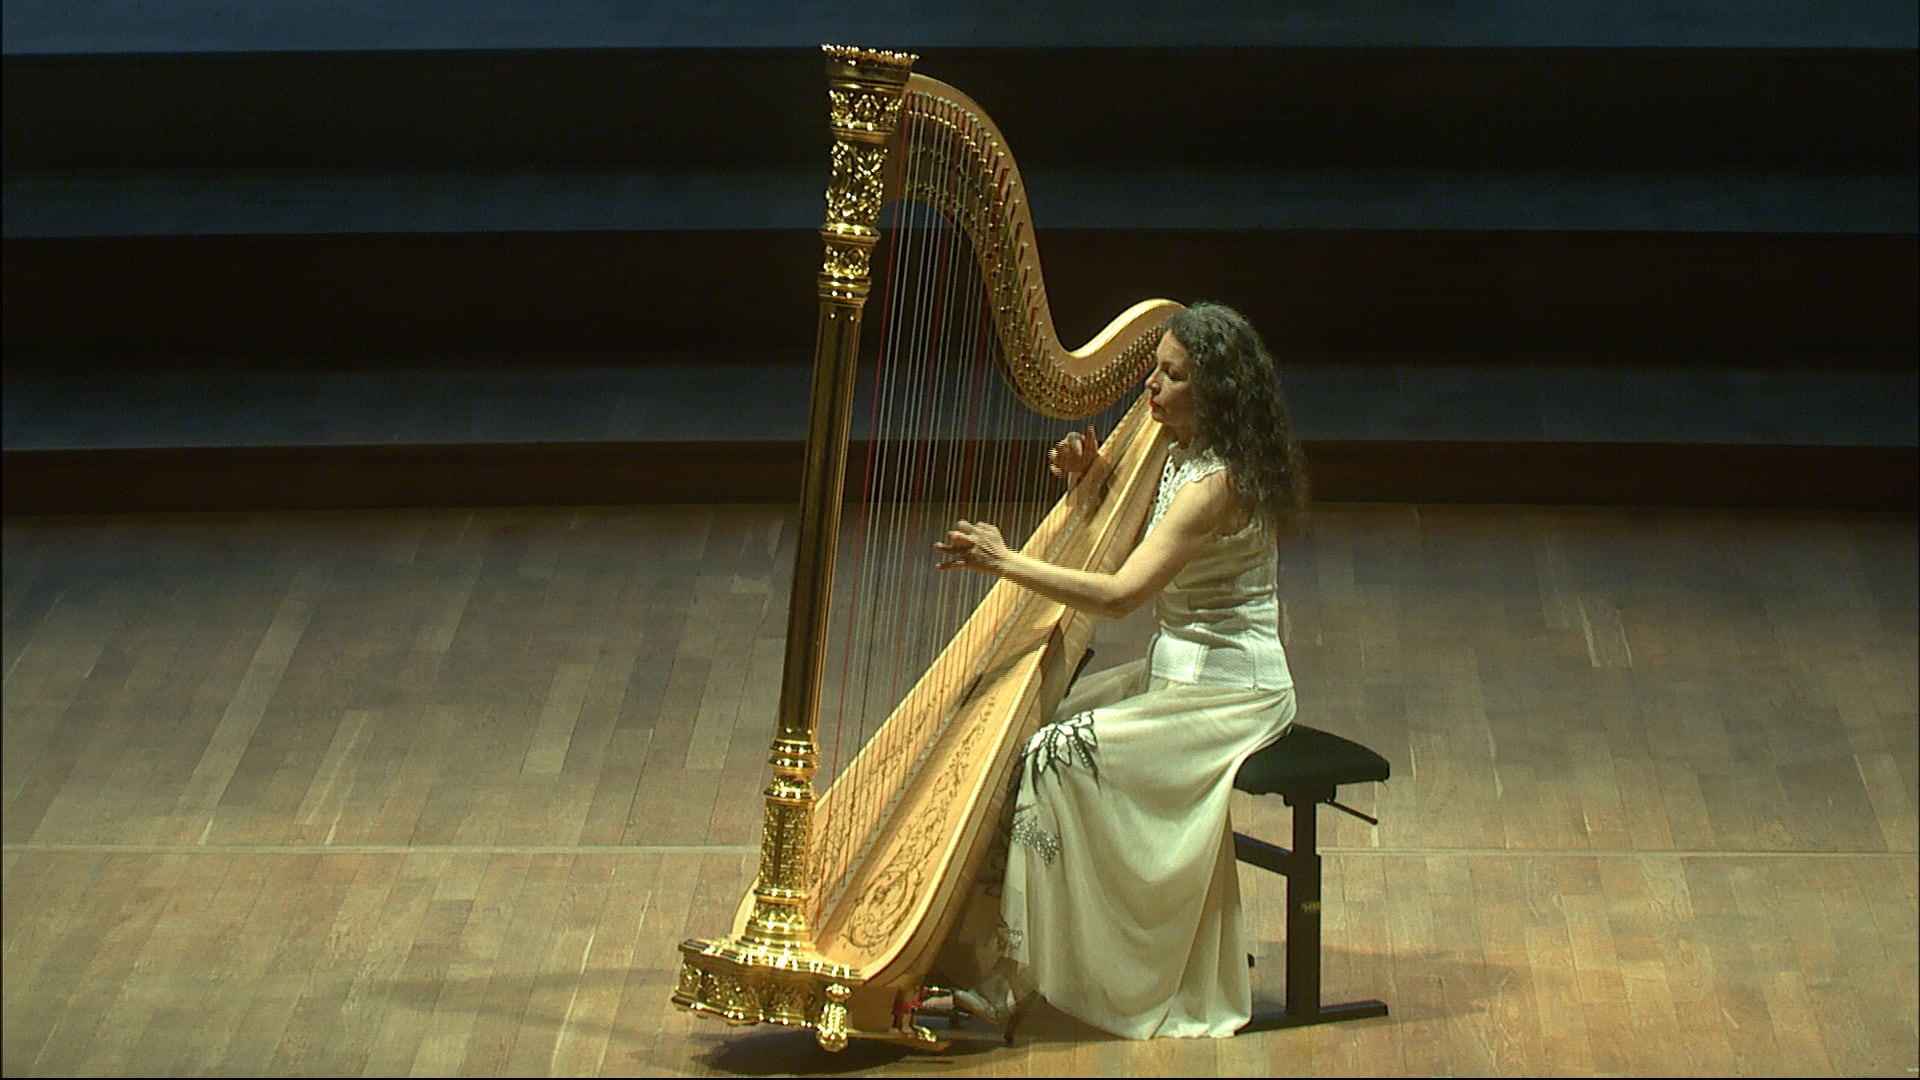 Koncert bez publika VIII